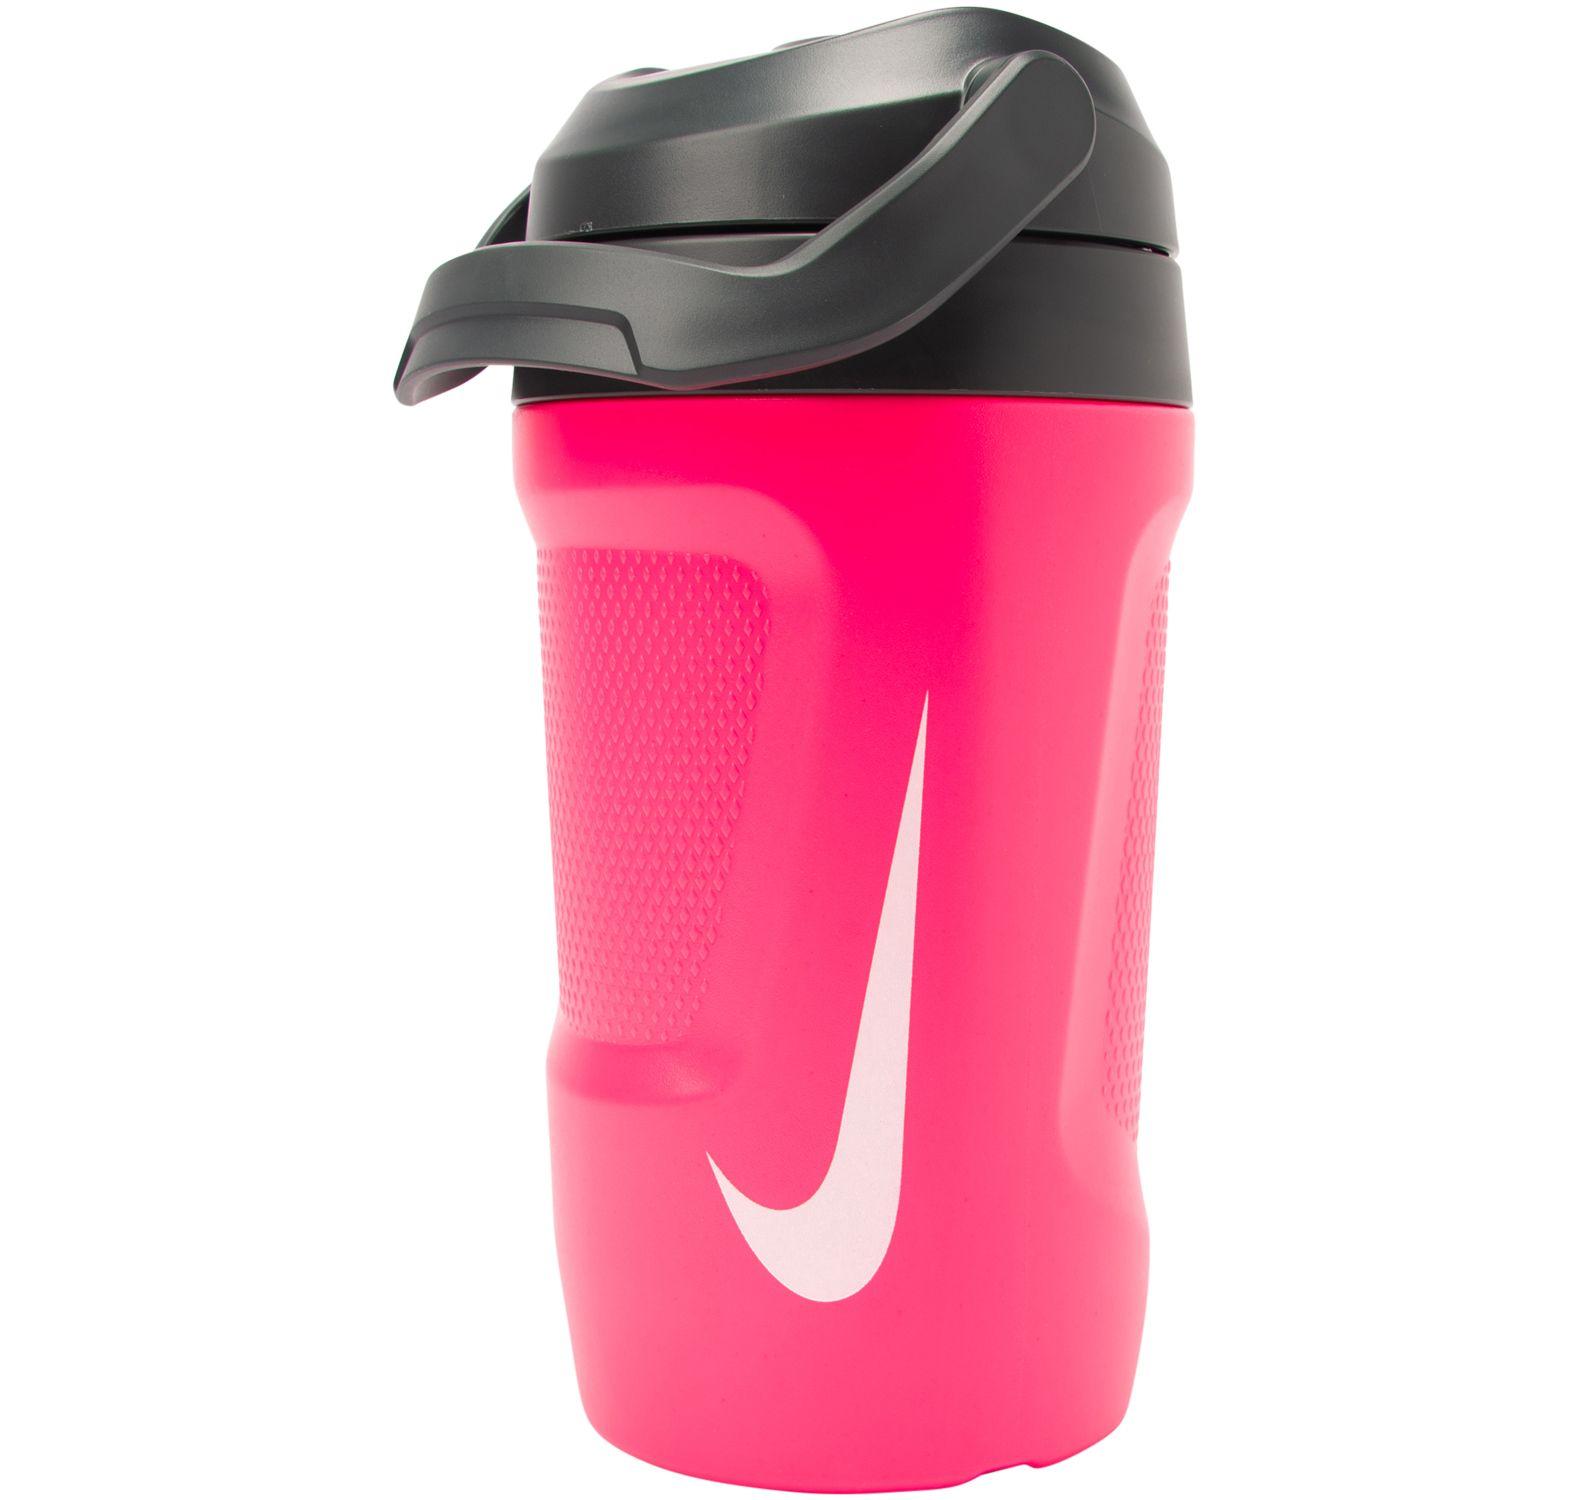 Nike Fuel Jug 64 Oz, Pink Pow/Anthracite/White, Onesize, Nike